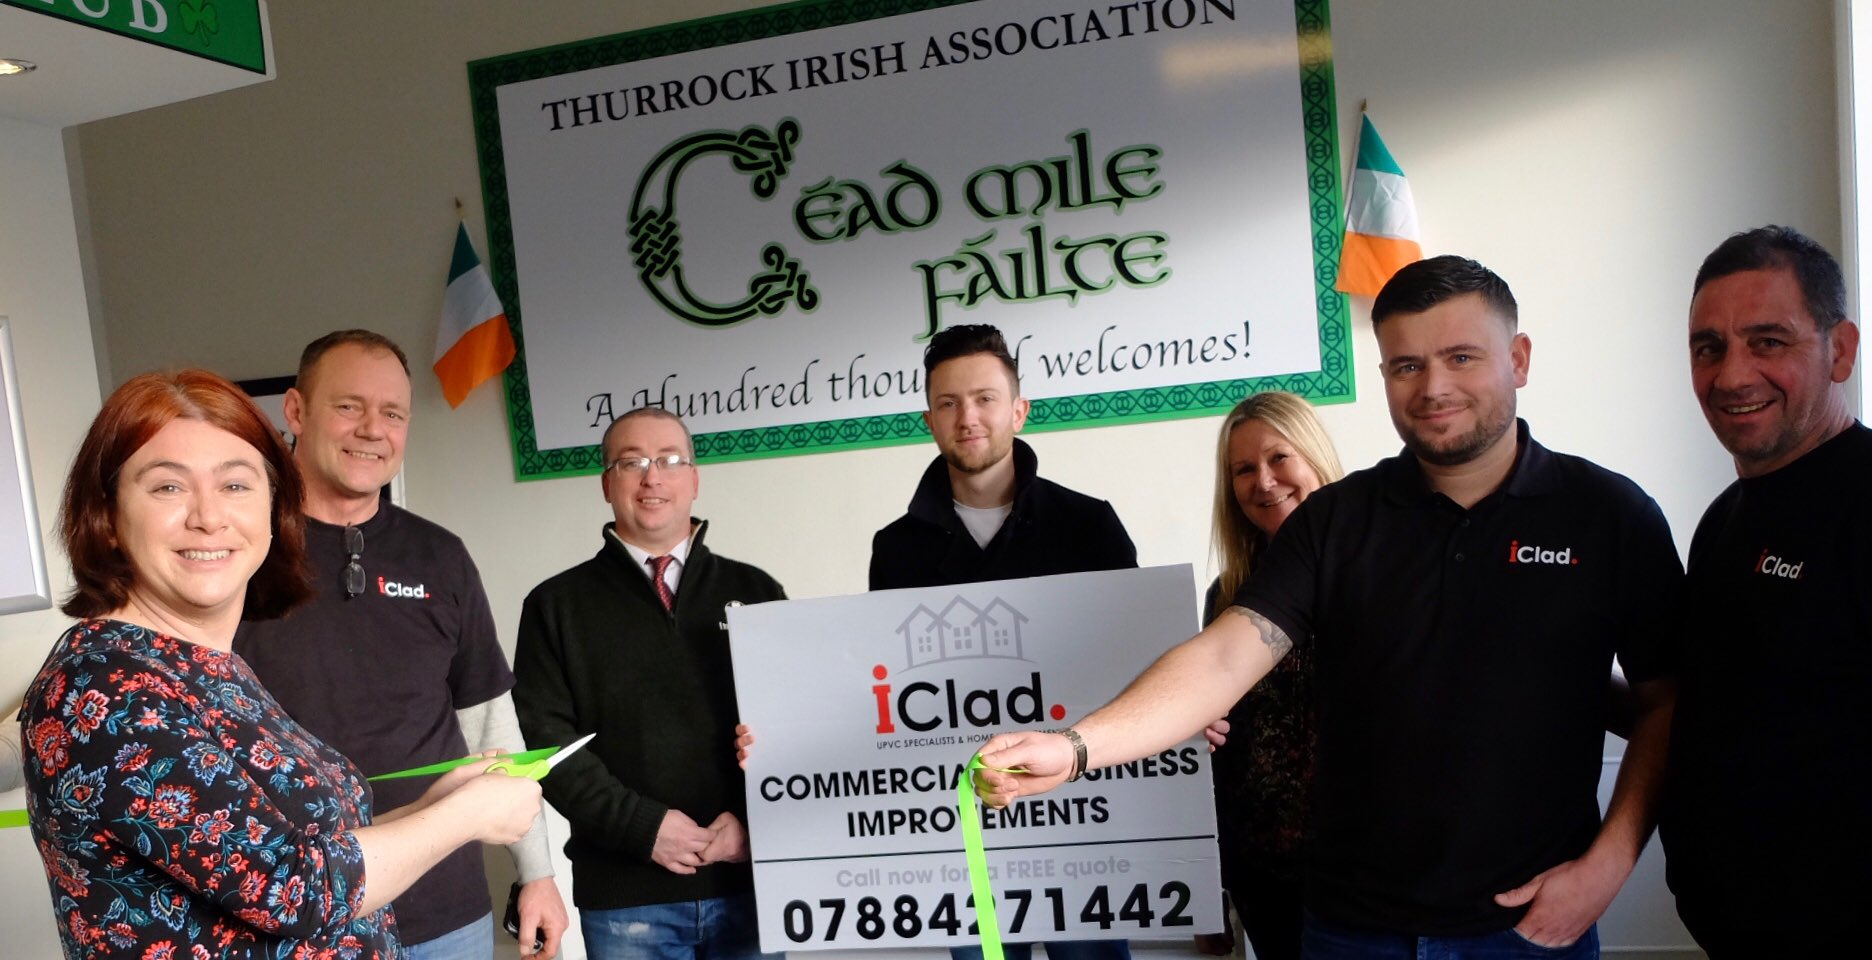 Thurrock Irish Association